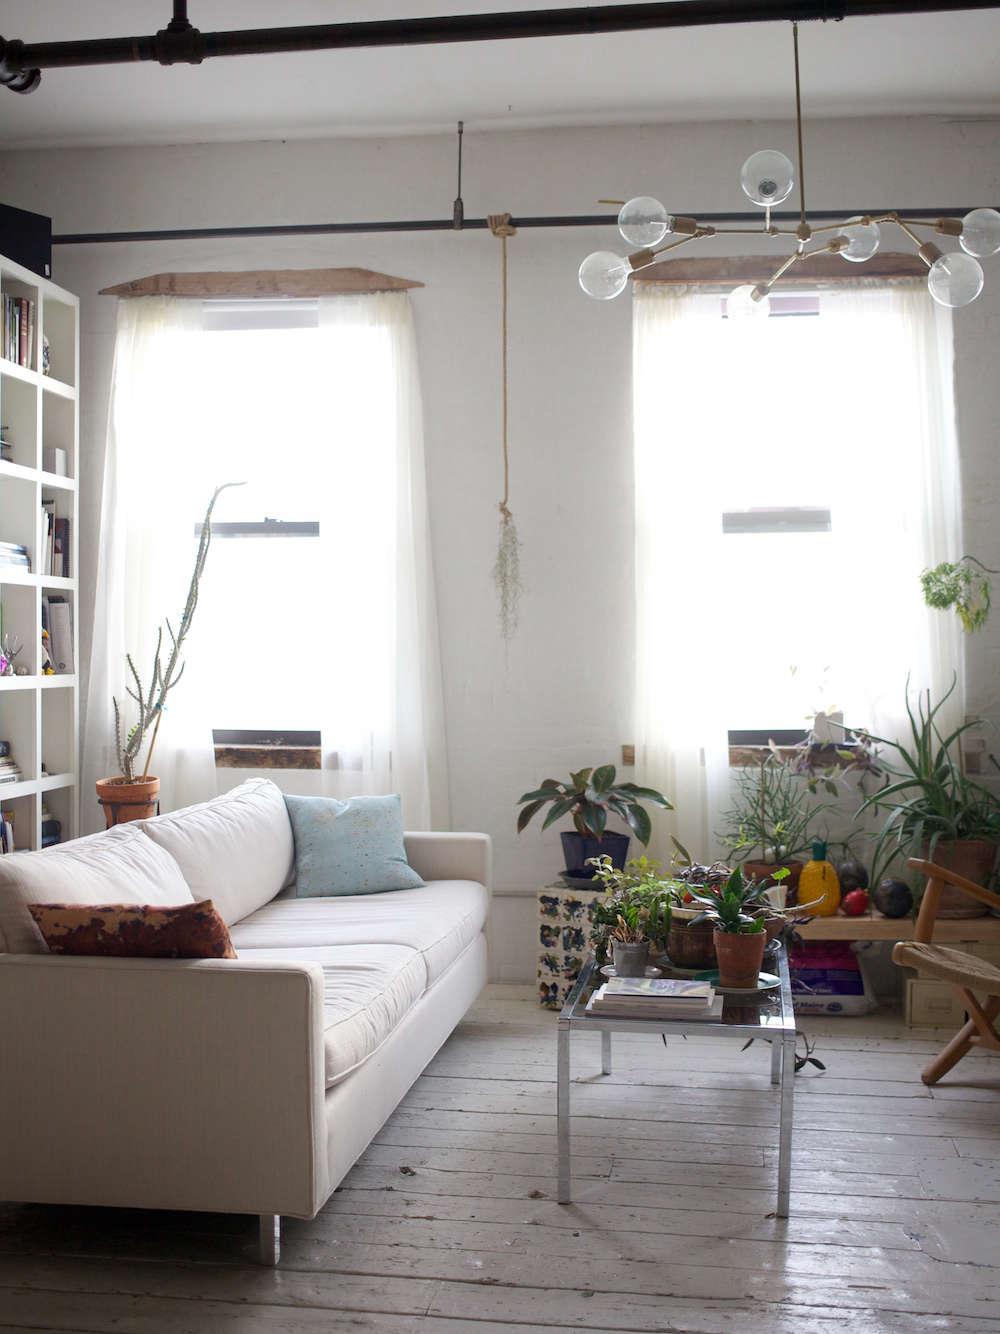 Shabd Simon Alexander Light-Filled Loft with Houseplants